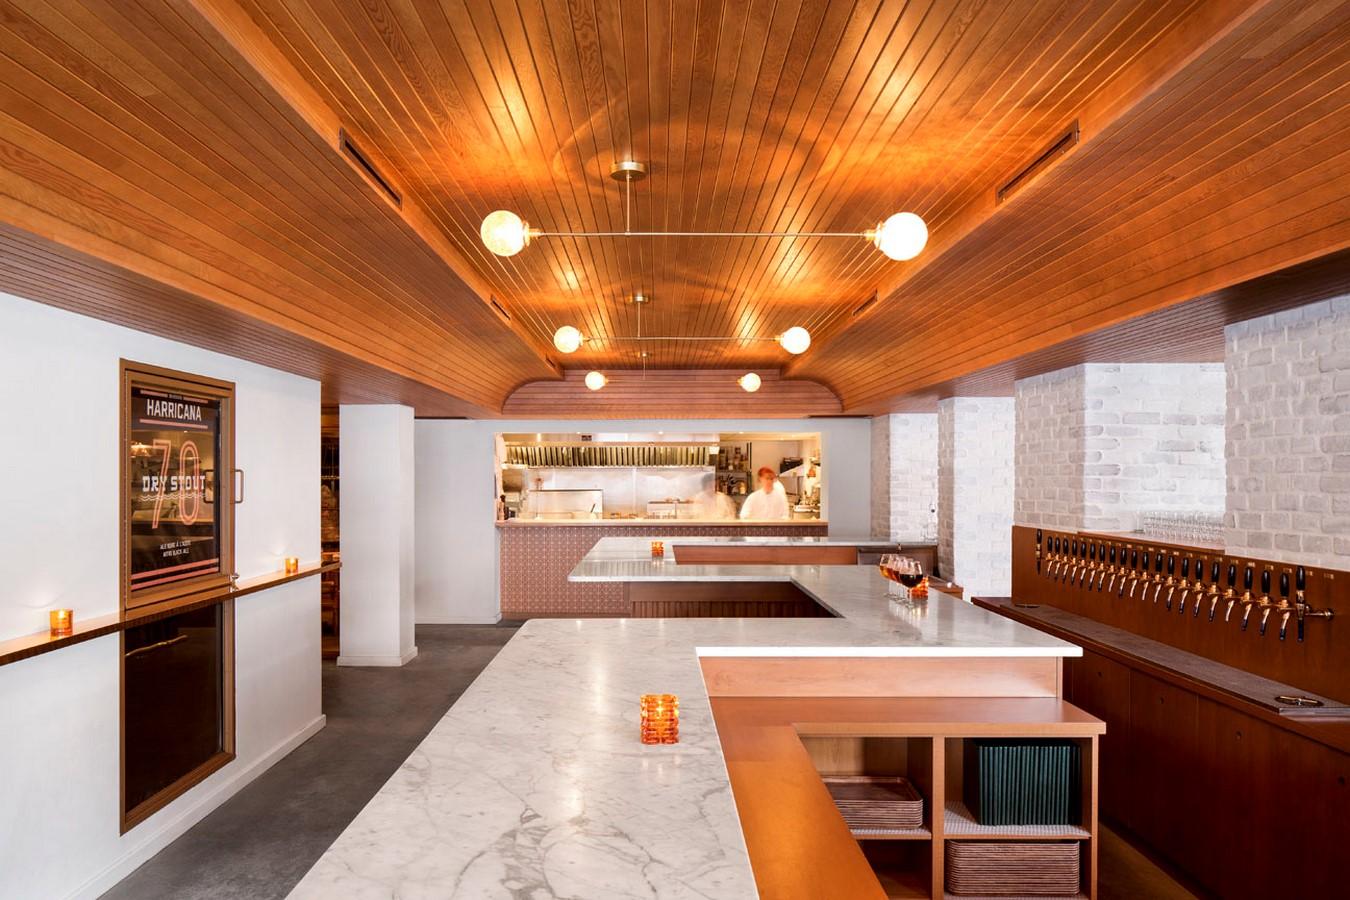 Brasserie Harricana by Alain Carle Architecte Inc - Sheet1